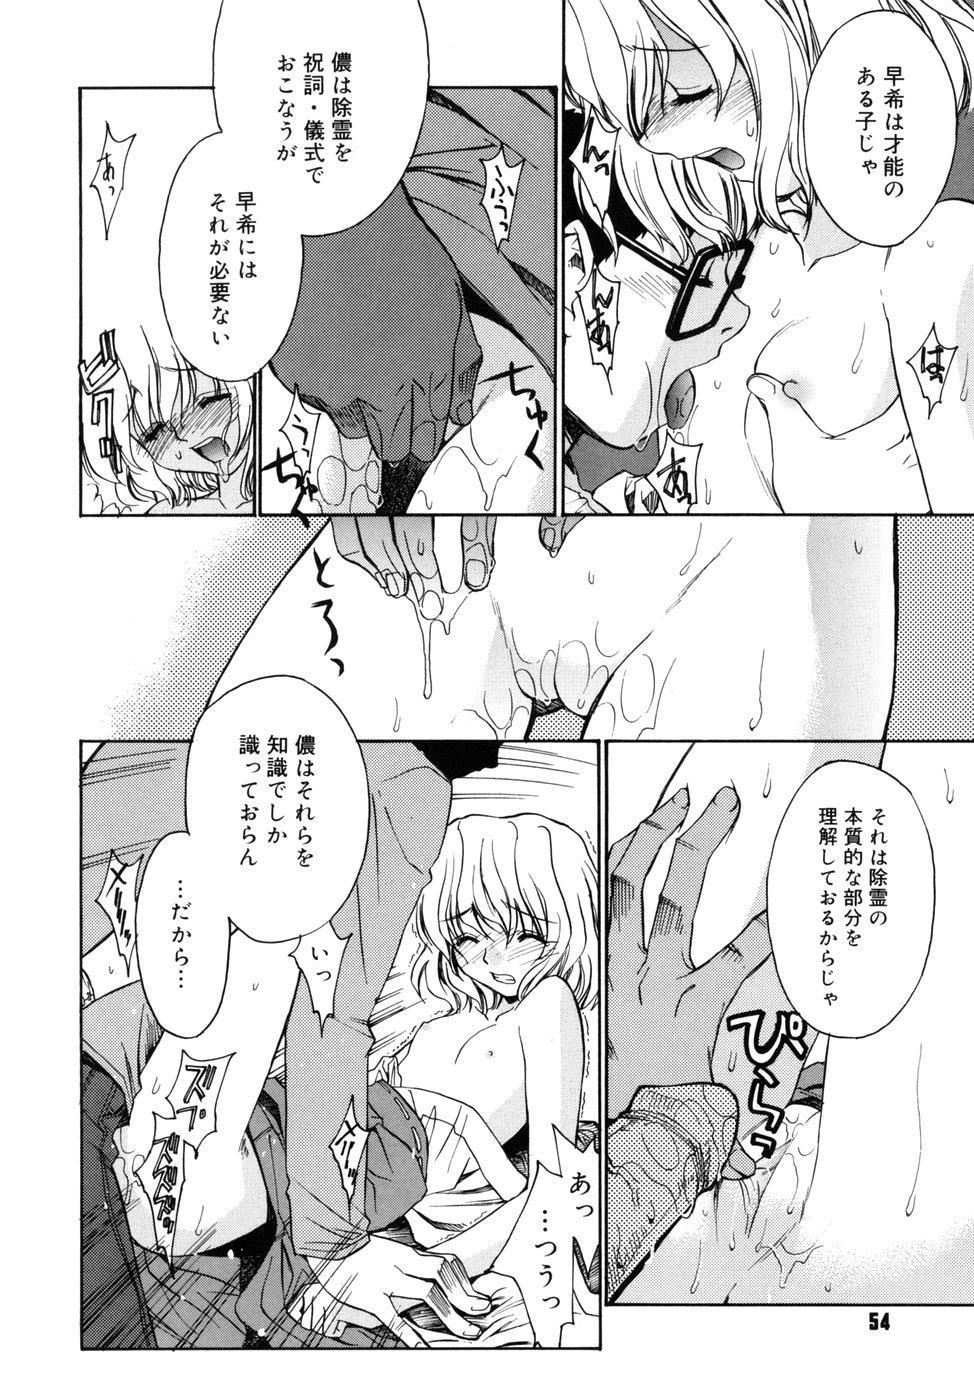 [Yaya Hinata] Tonari no Miko-san wa Minna Warau - The next shrine maidens smile in everyone. 53